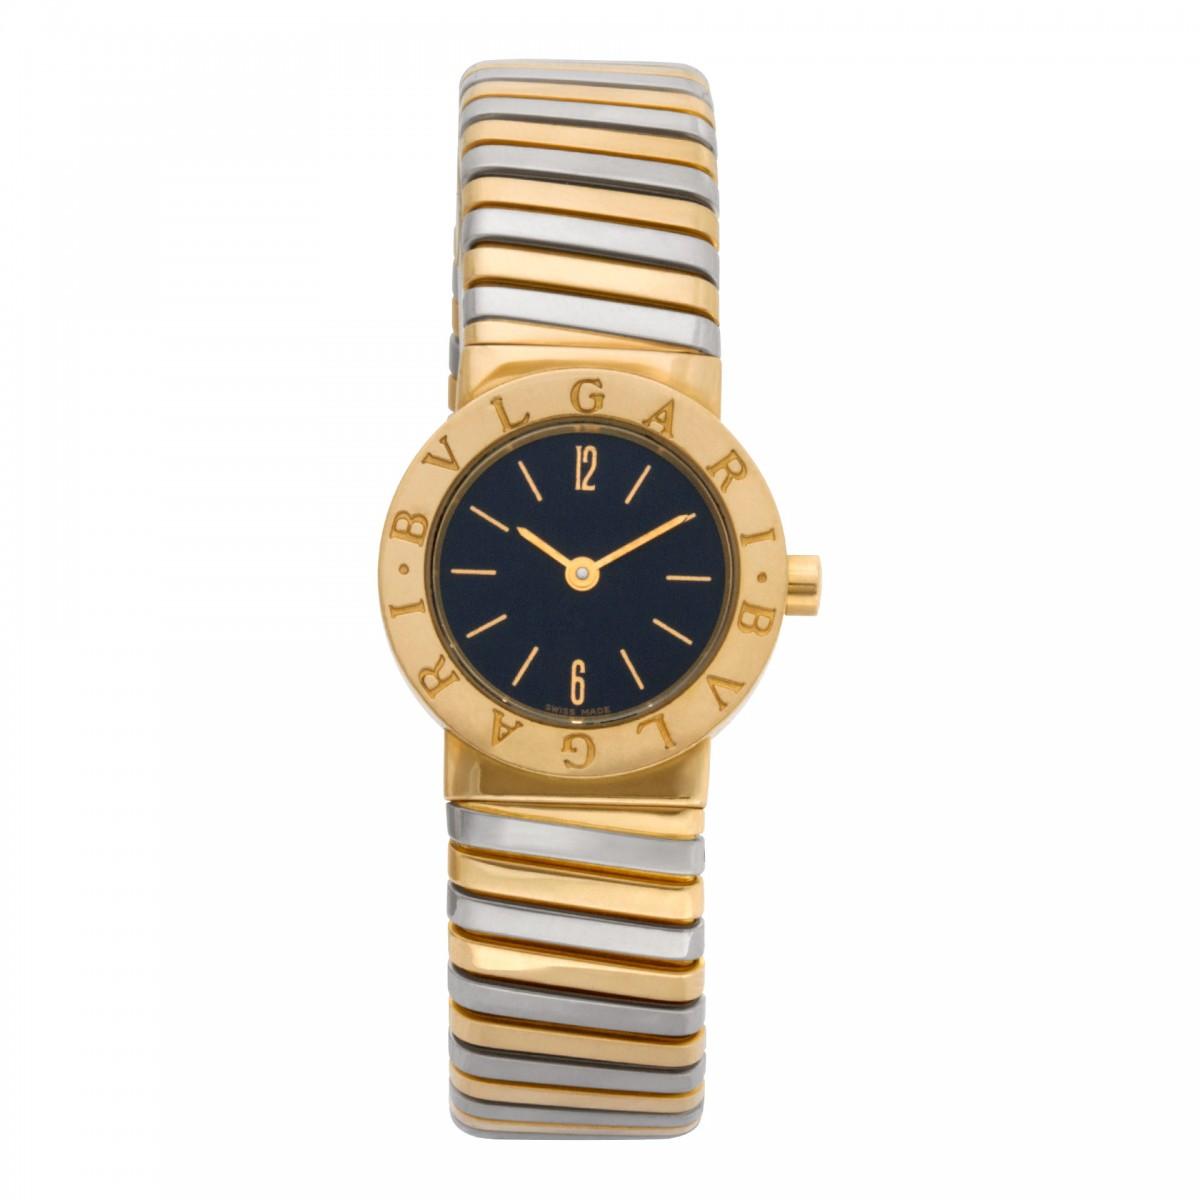 ... Black dial 23mm Quartz watch. Item   W521412. Bvlgari Tubogas BB23T  image 1 · Bvlgari Tubogas BB23T image 2 ... b1a64fd1b05ed